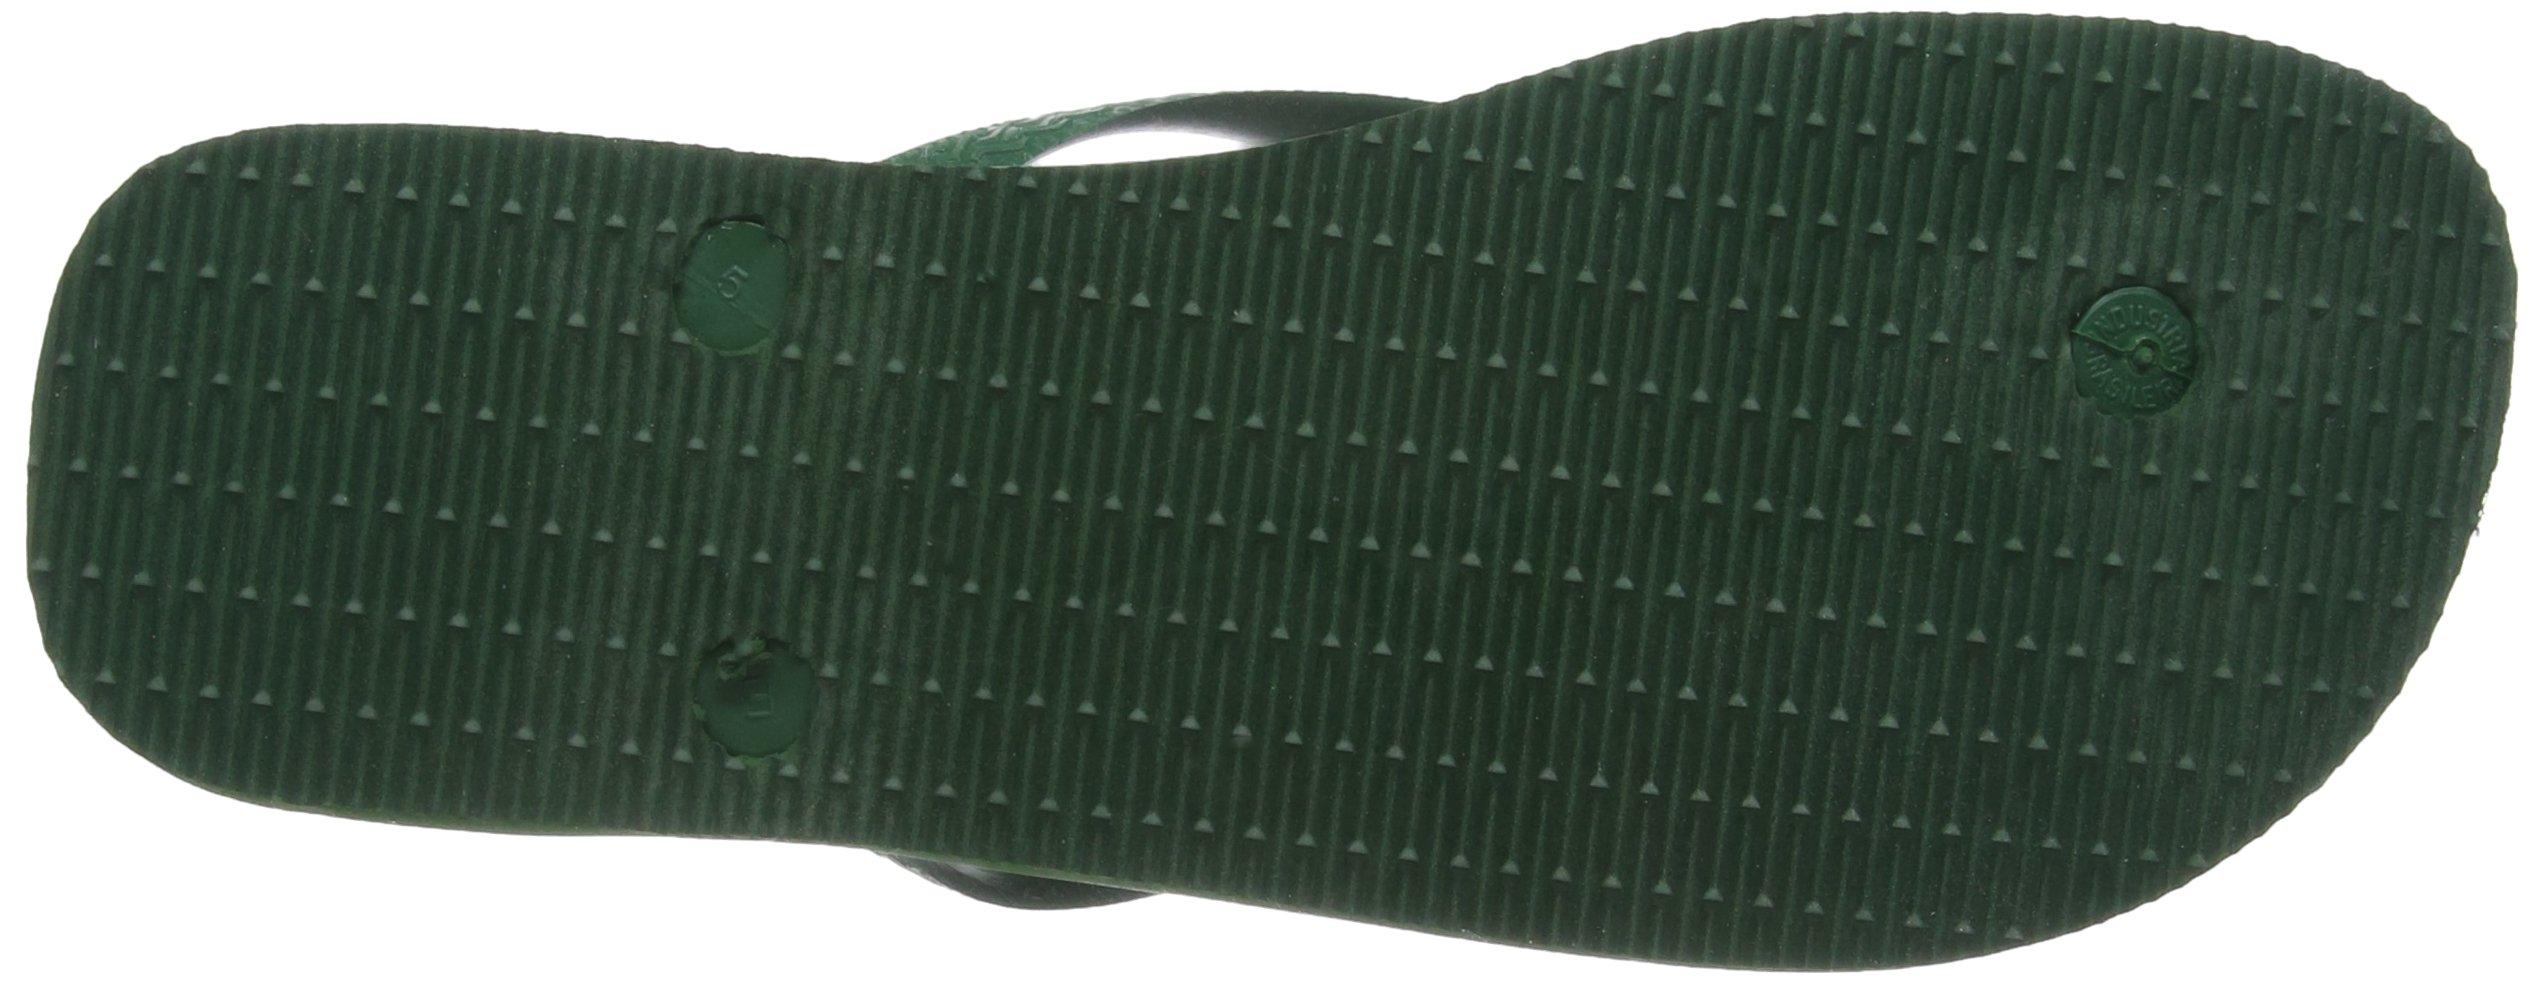 Havaianas Brasil, Unisex Adult's Flip Flops, Green (Brasil Amazonia), 3/4 UK (37/38EU) (35/36 BR) by Havaianas (Image #4)